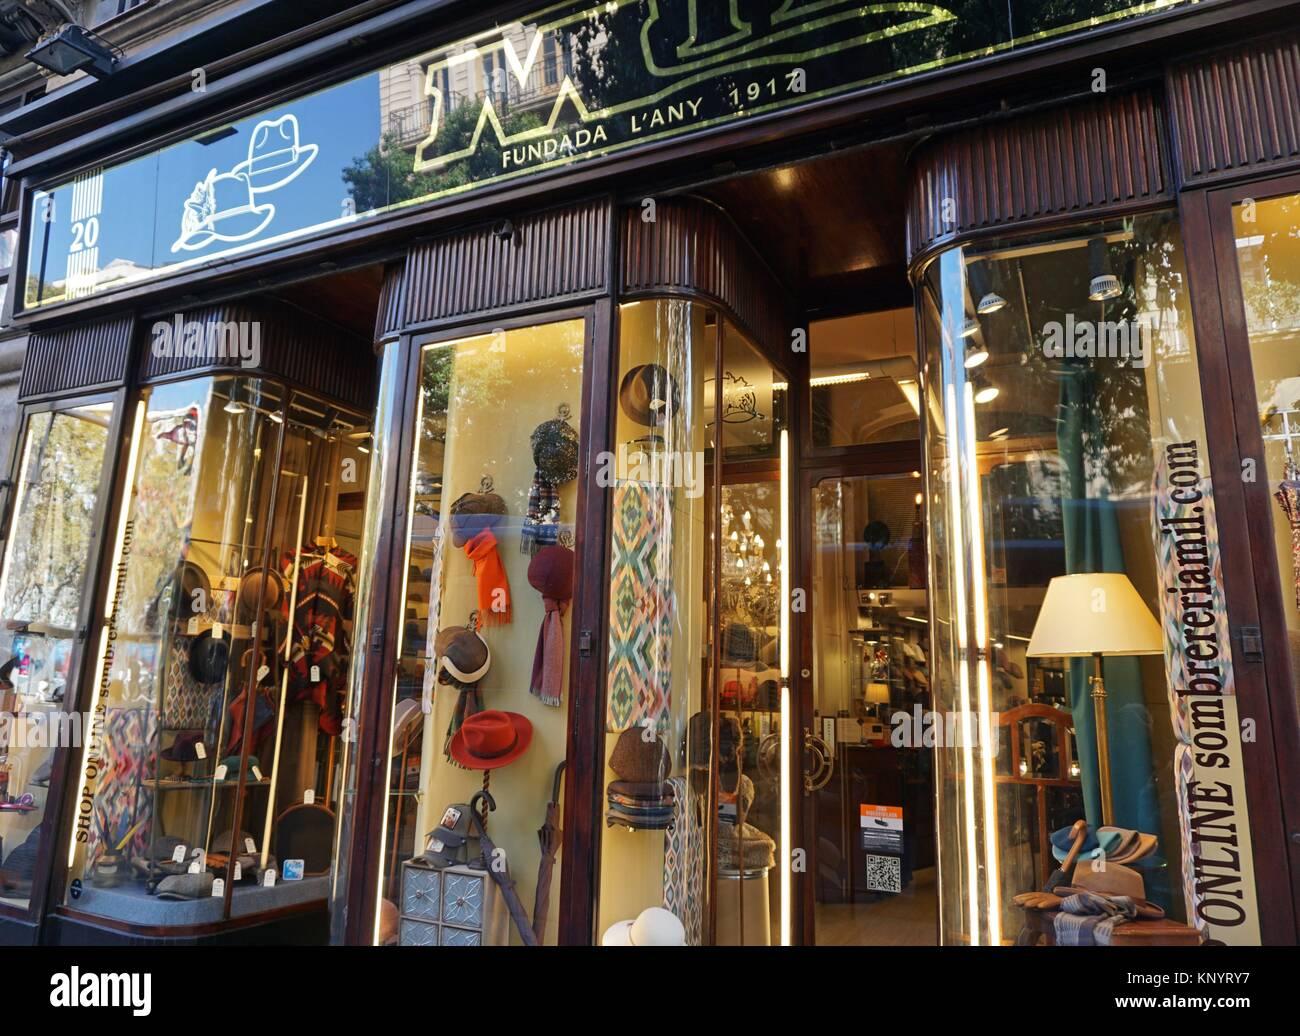 8307fa4e8acfb Sombrero Viejo en la tienda de la Calle Fontanella. Barcelona ...